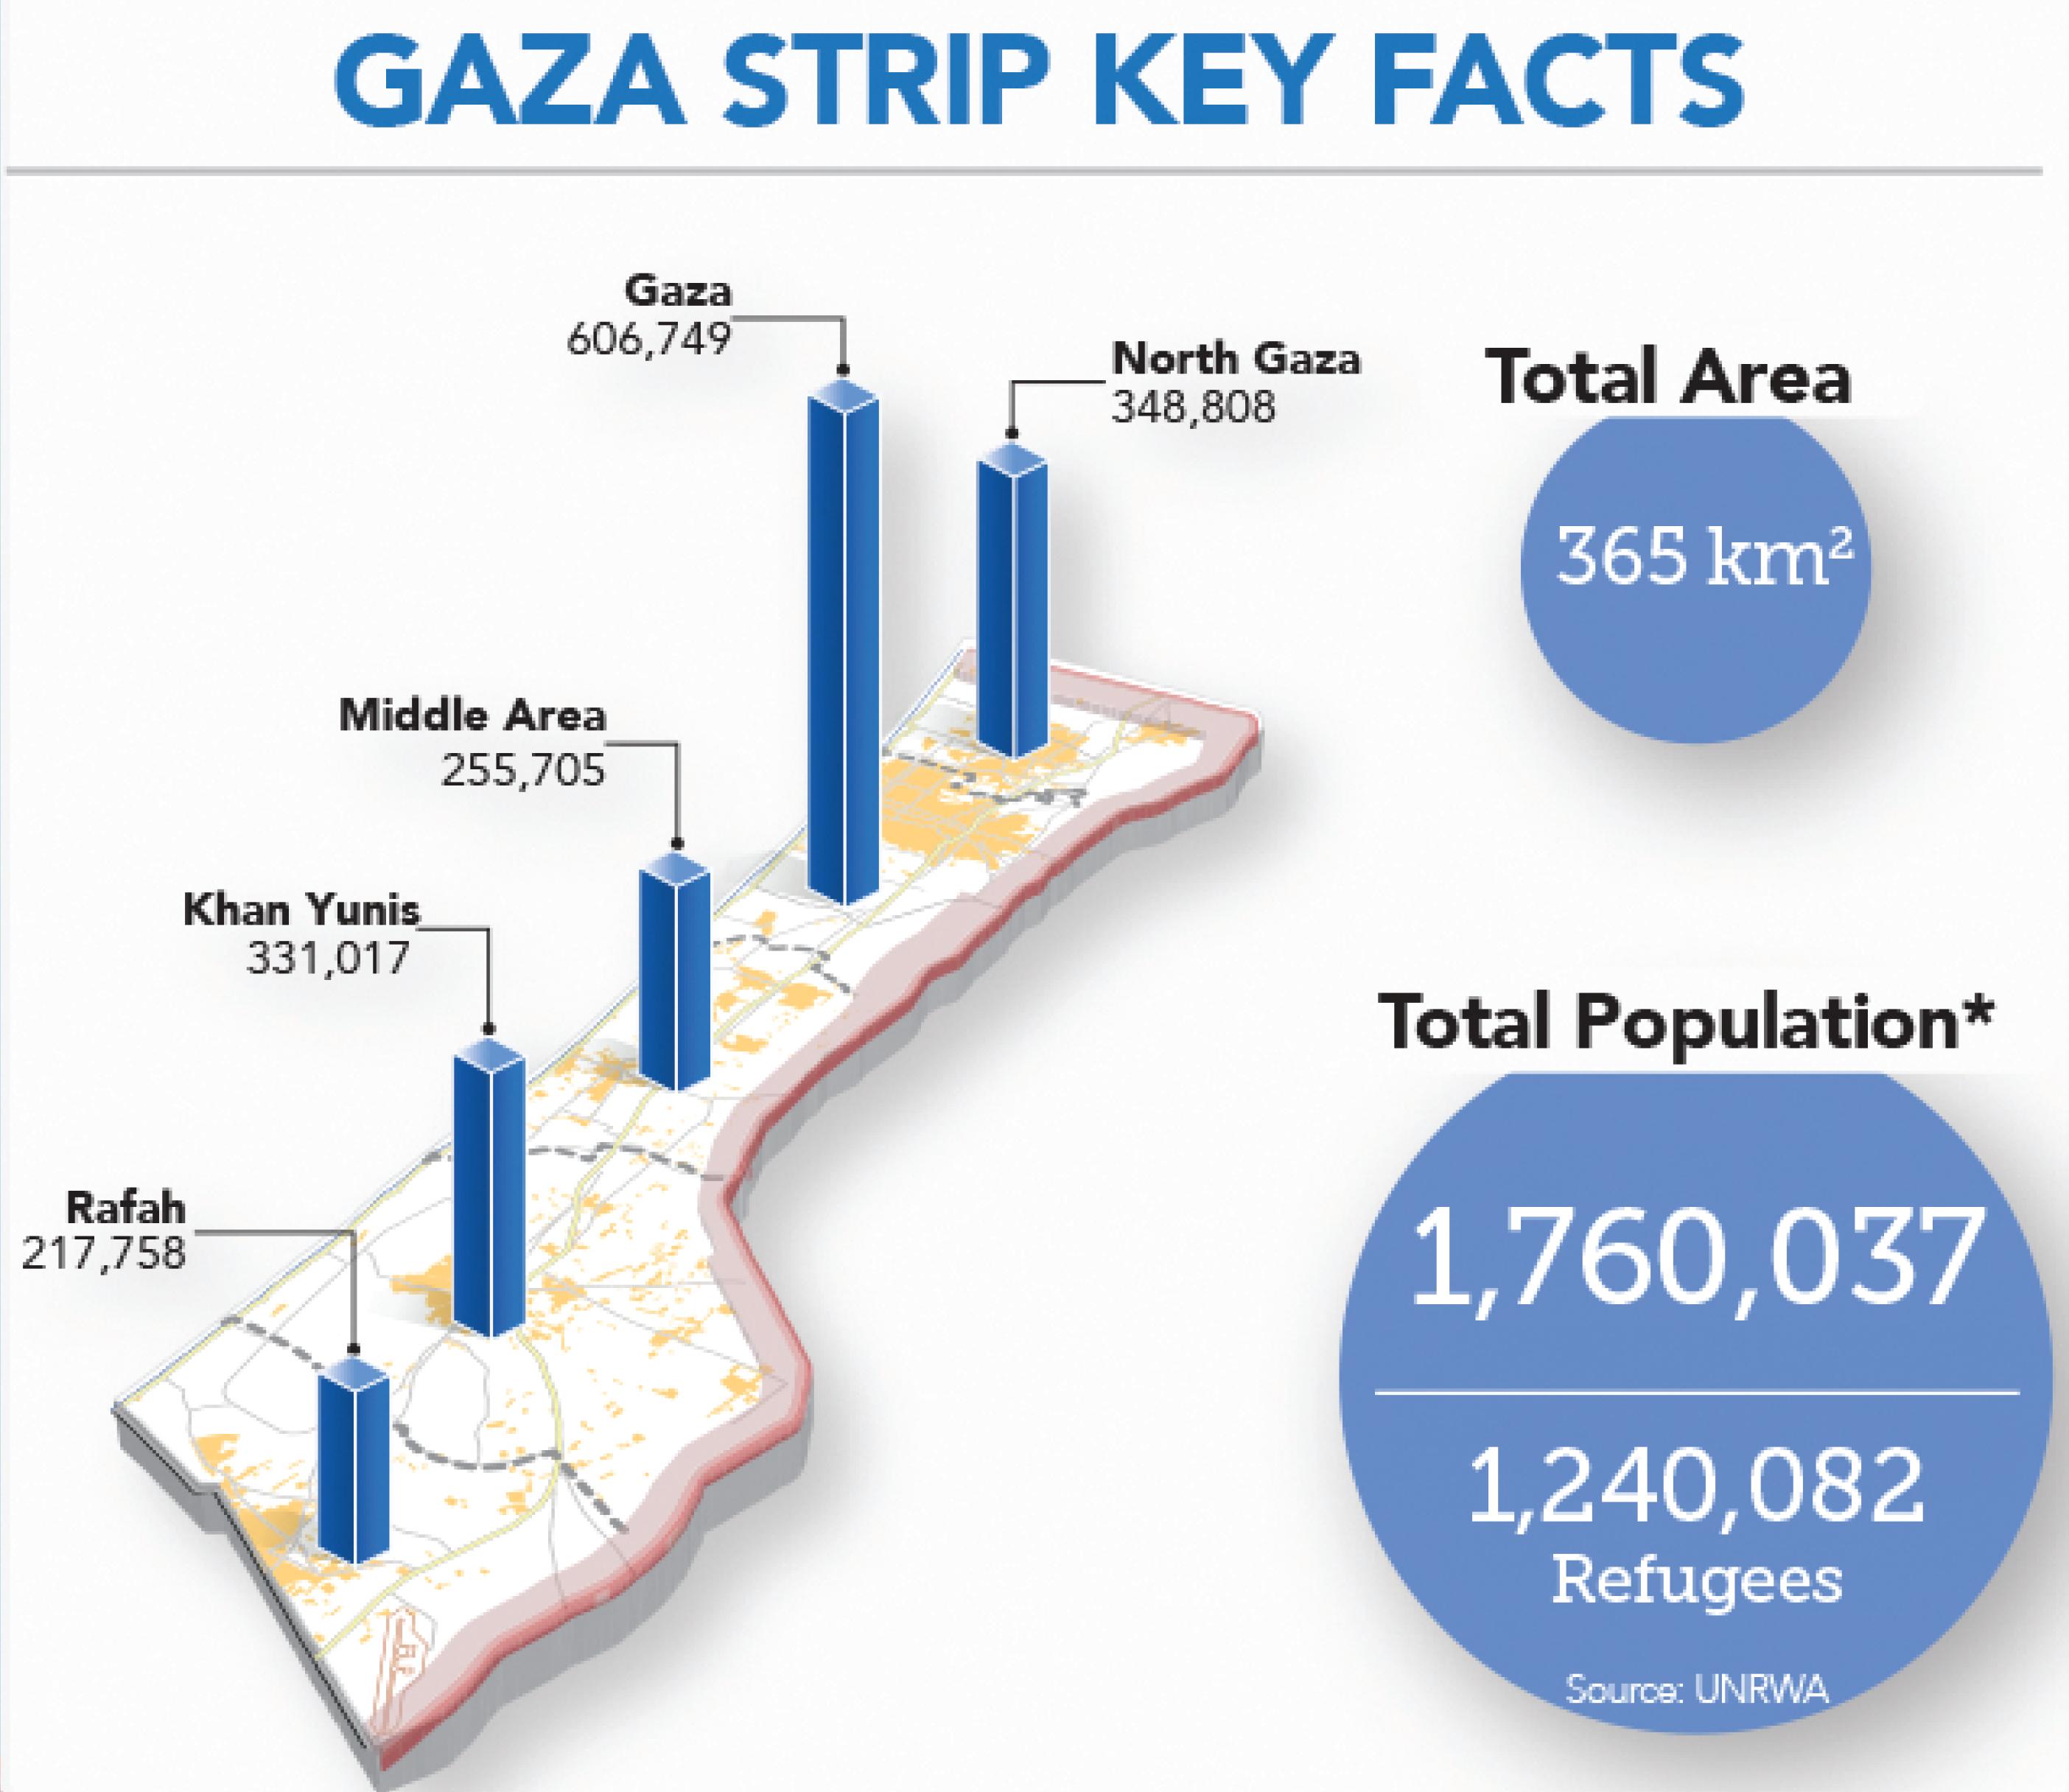 Gaza strip facts